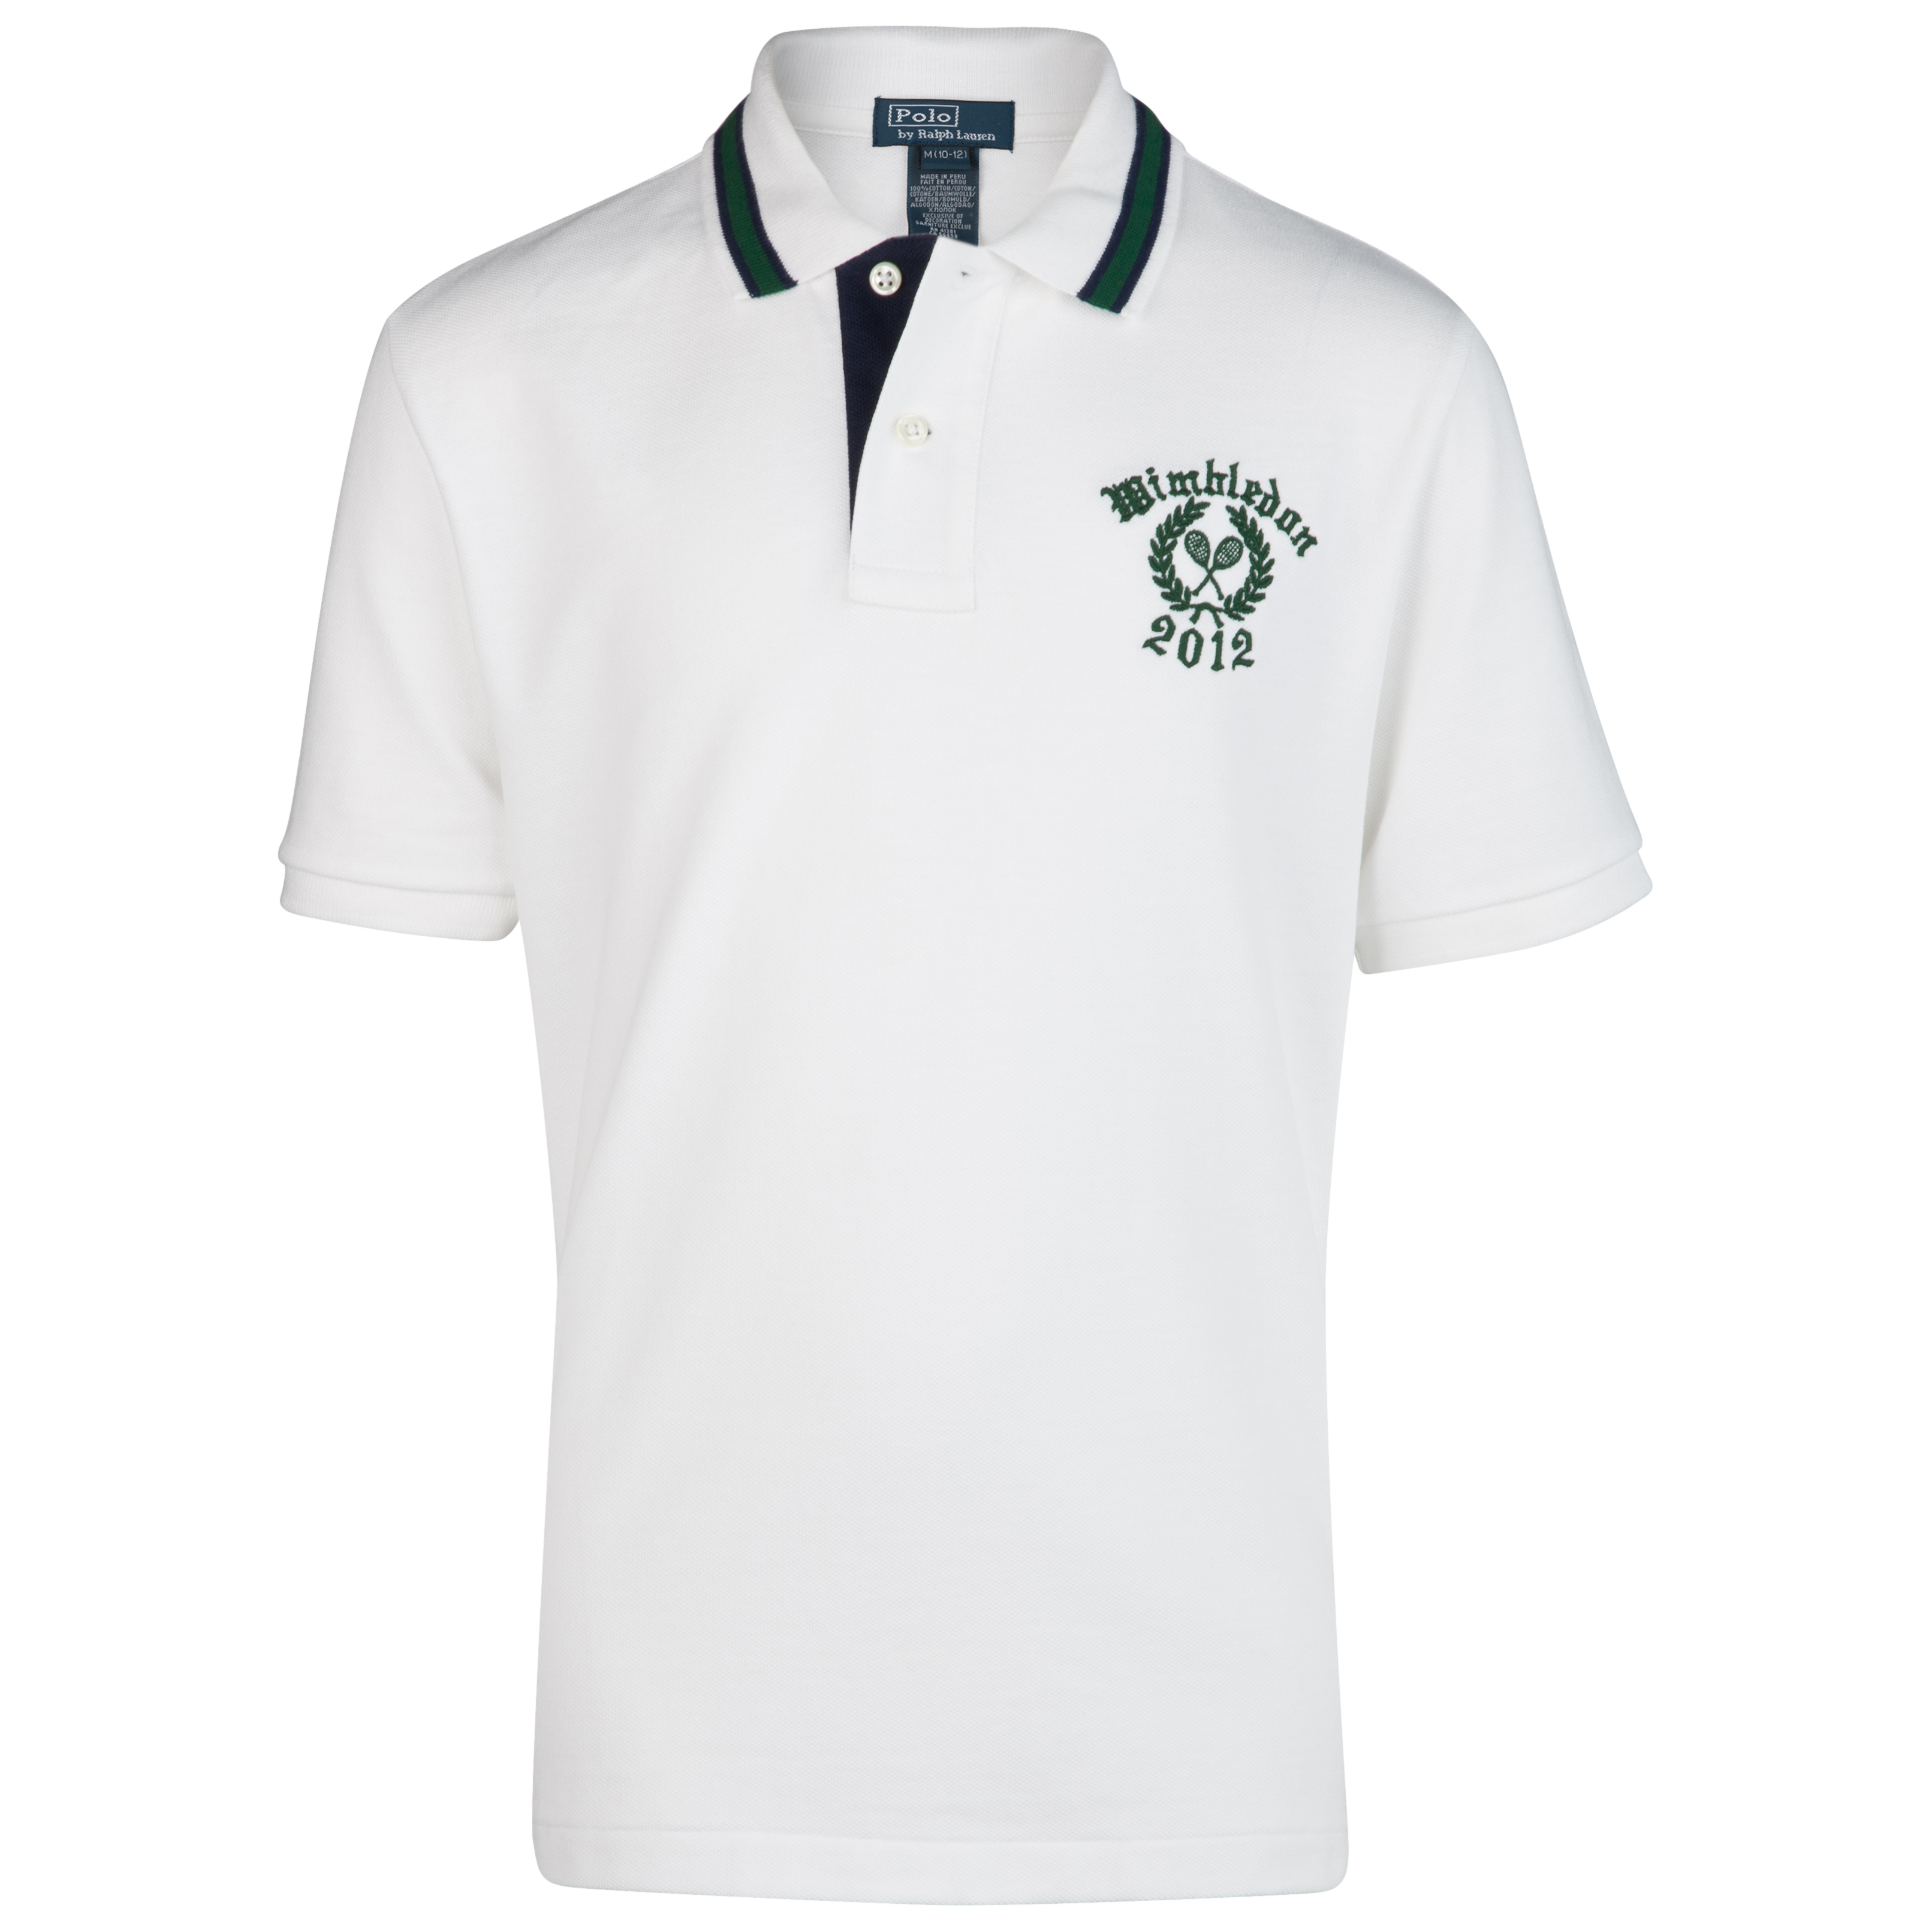 Polo Ralph Lauren Polo Big PP Mesh Polo - Classic Oxford White - Older Boys